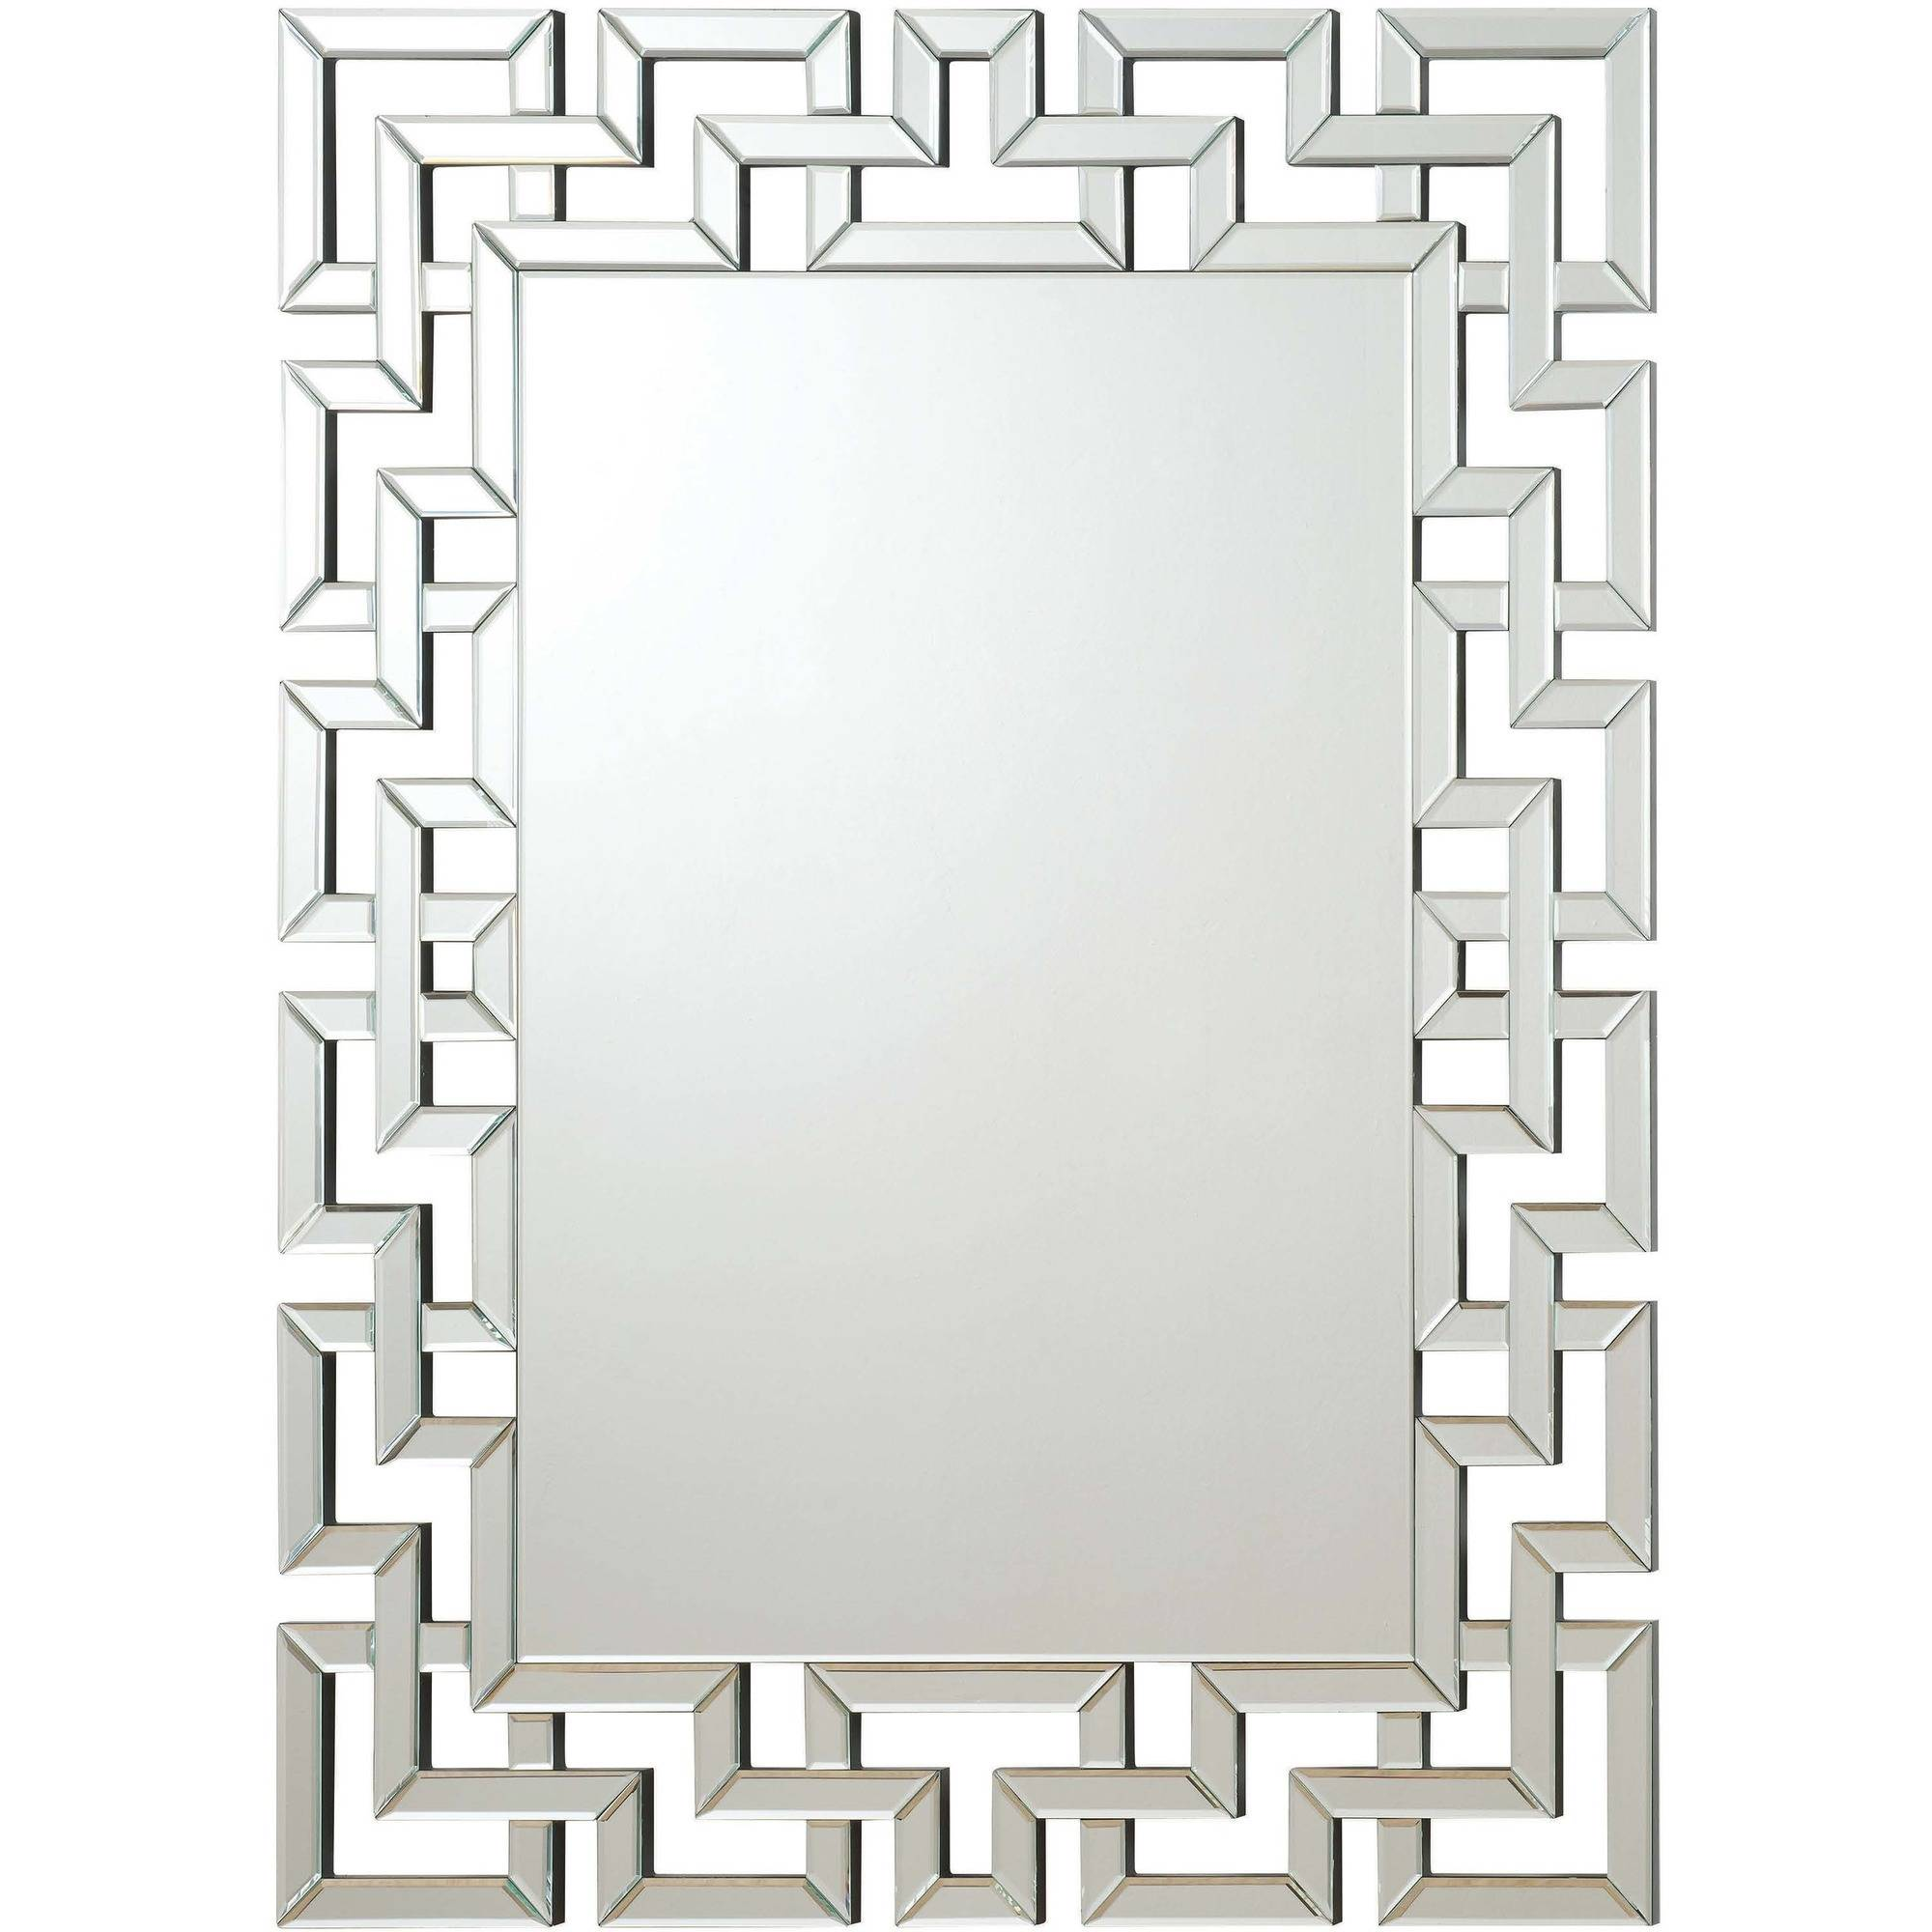 Coaster Company Mirror with Interlocking Frameless Greek Key Design by Coaster Company